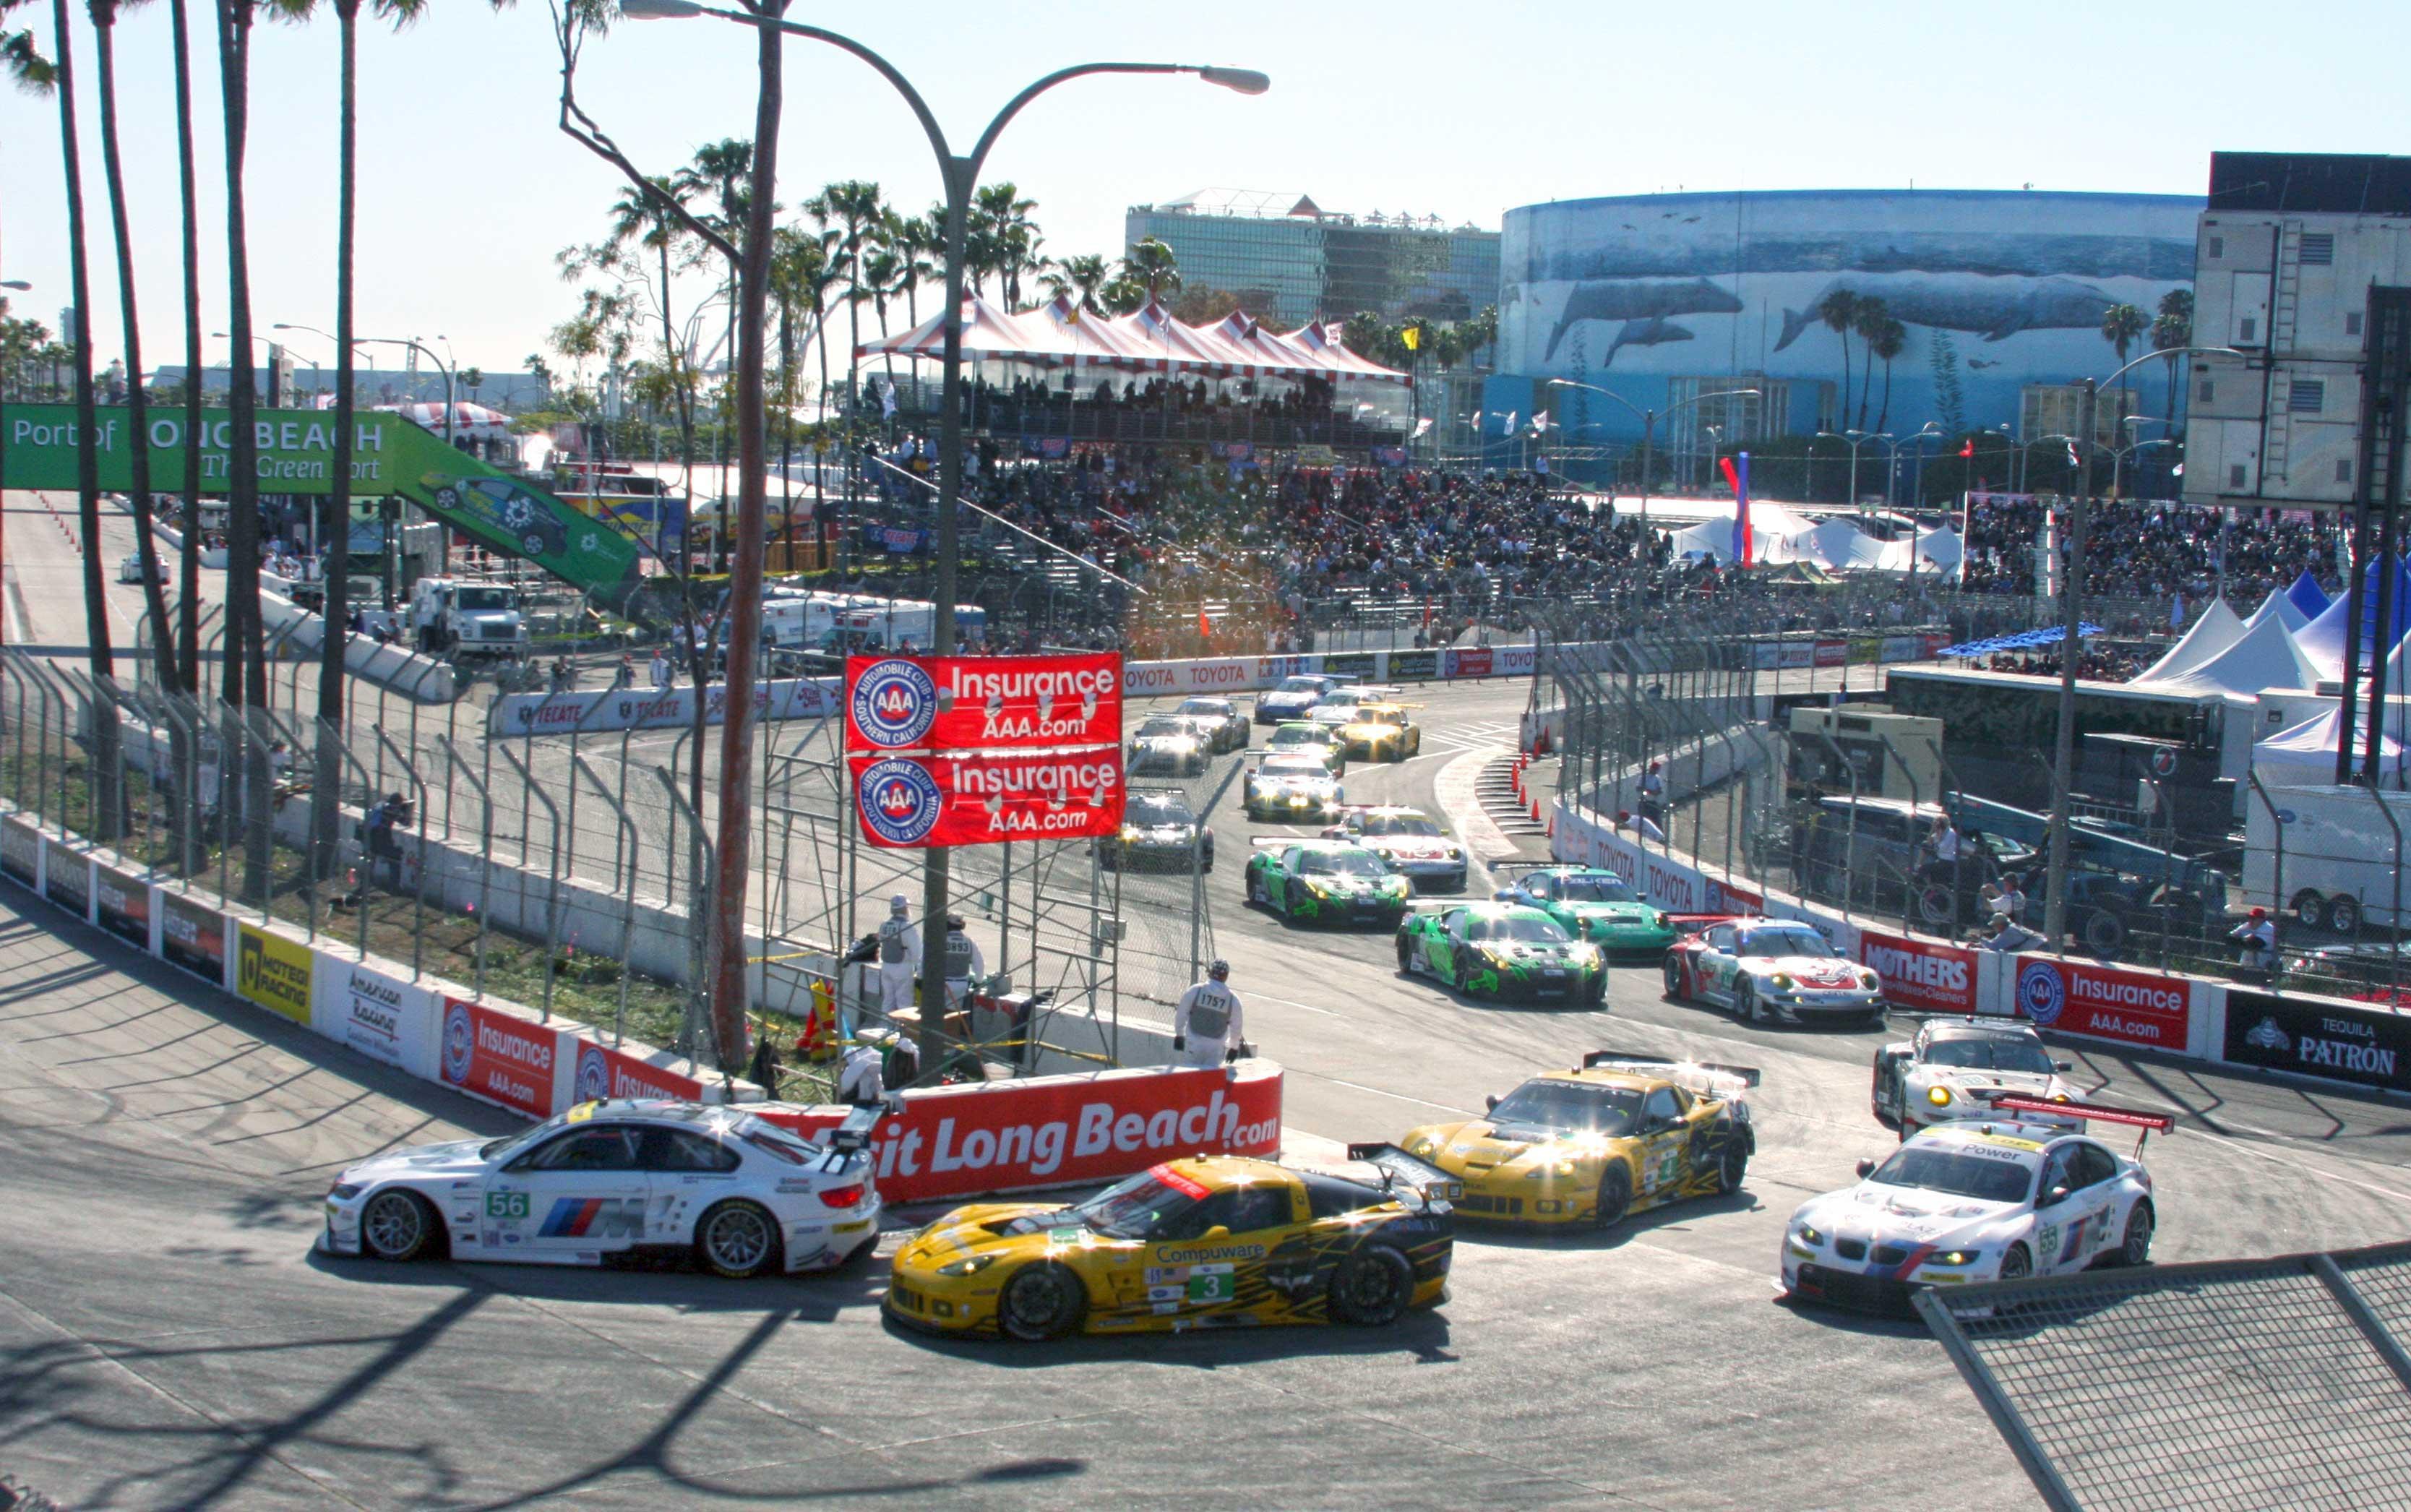 First Lap Toyota Grand Prix Of Long Beach